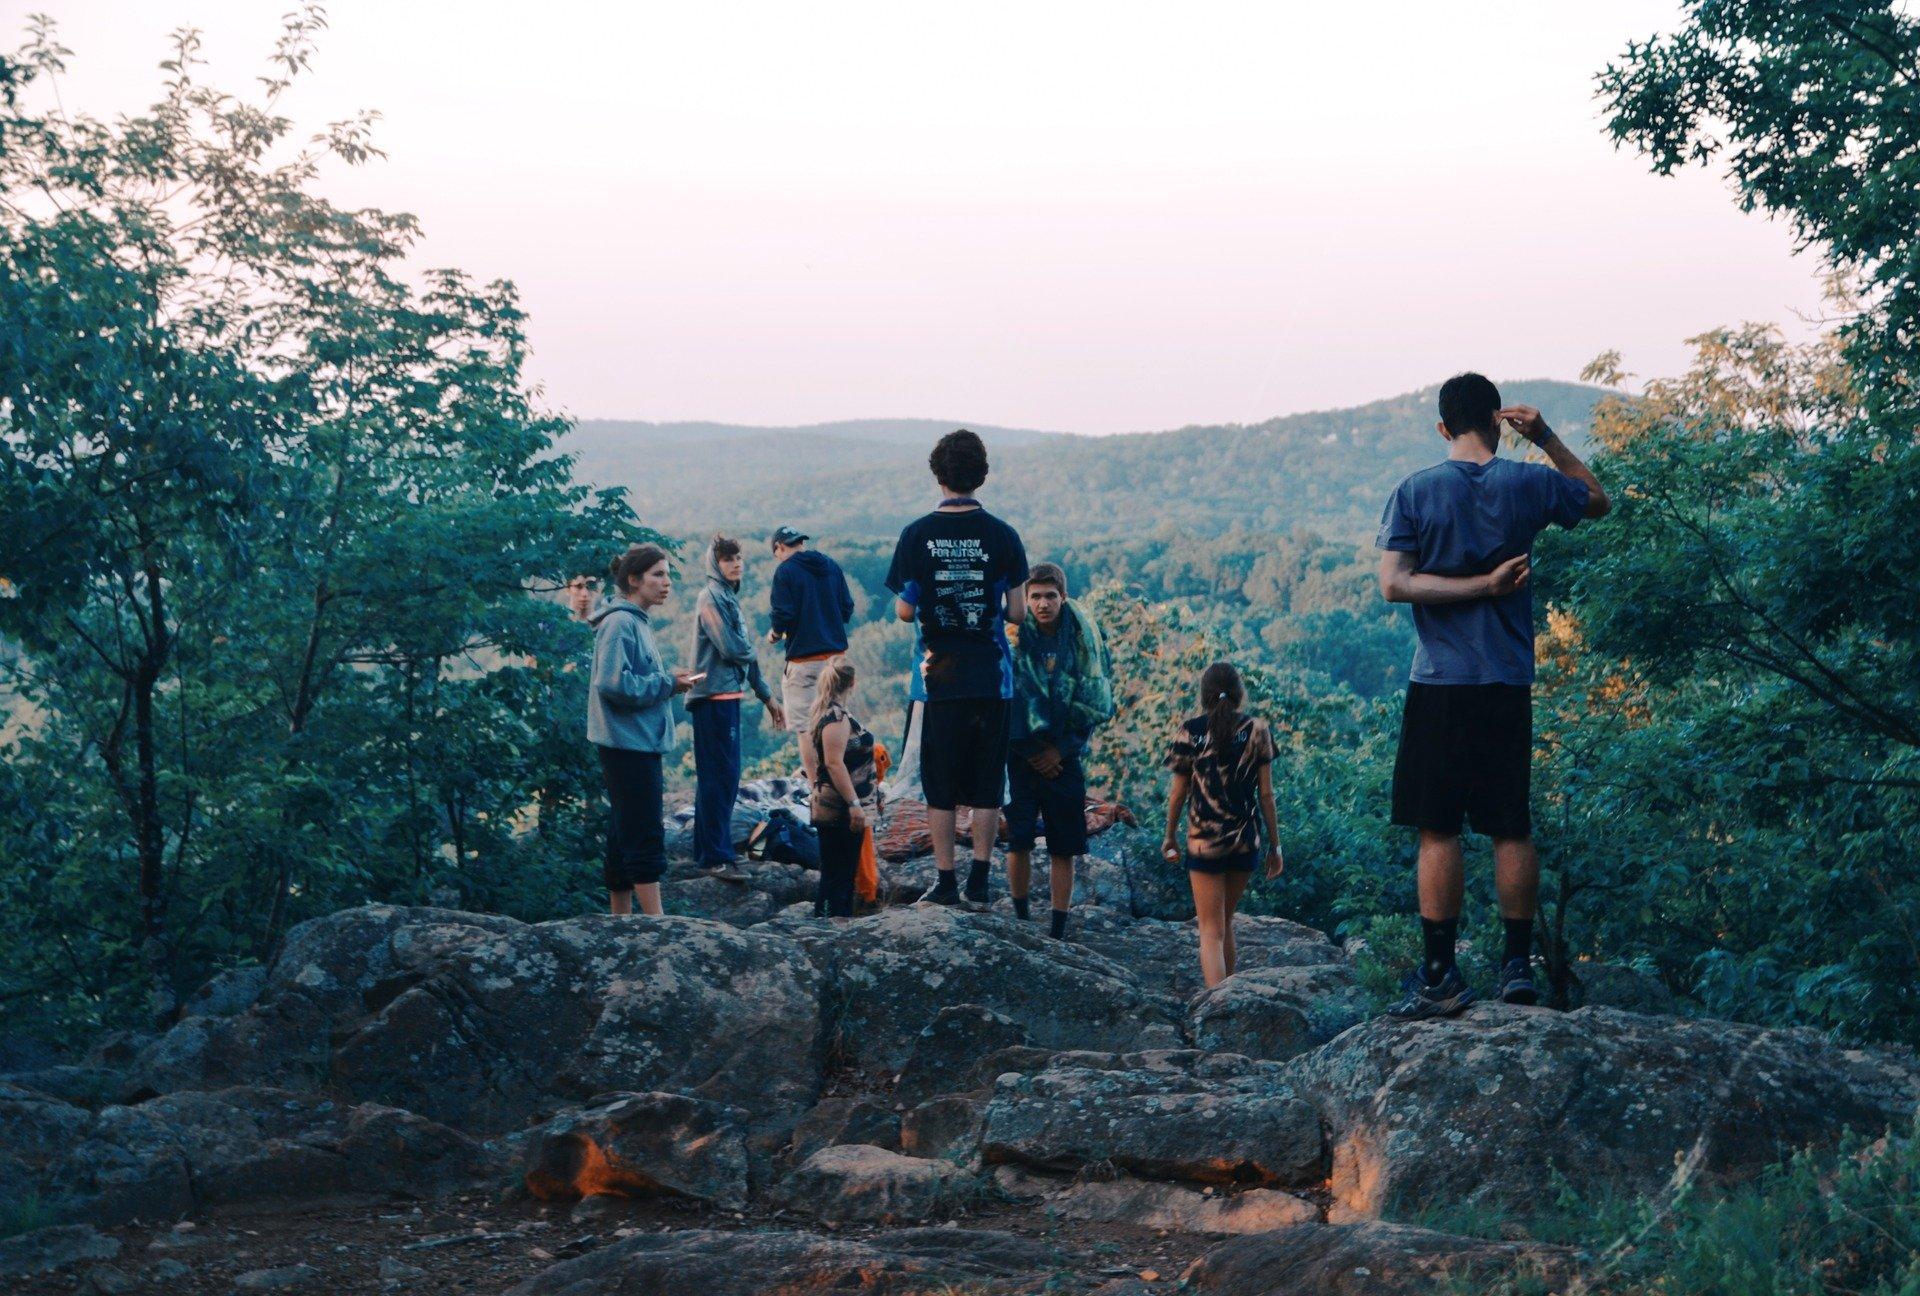 amis vacance en montagne